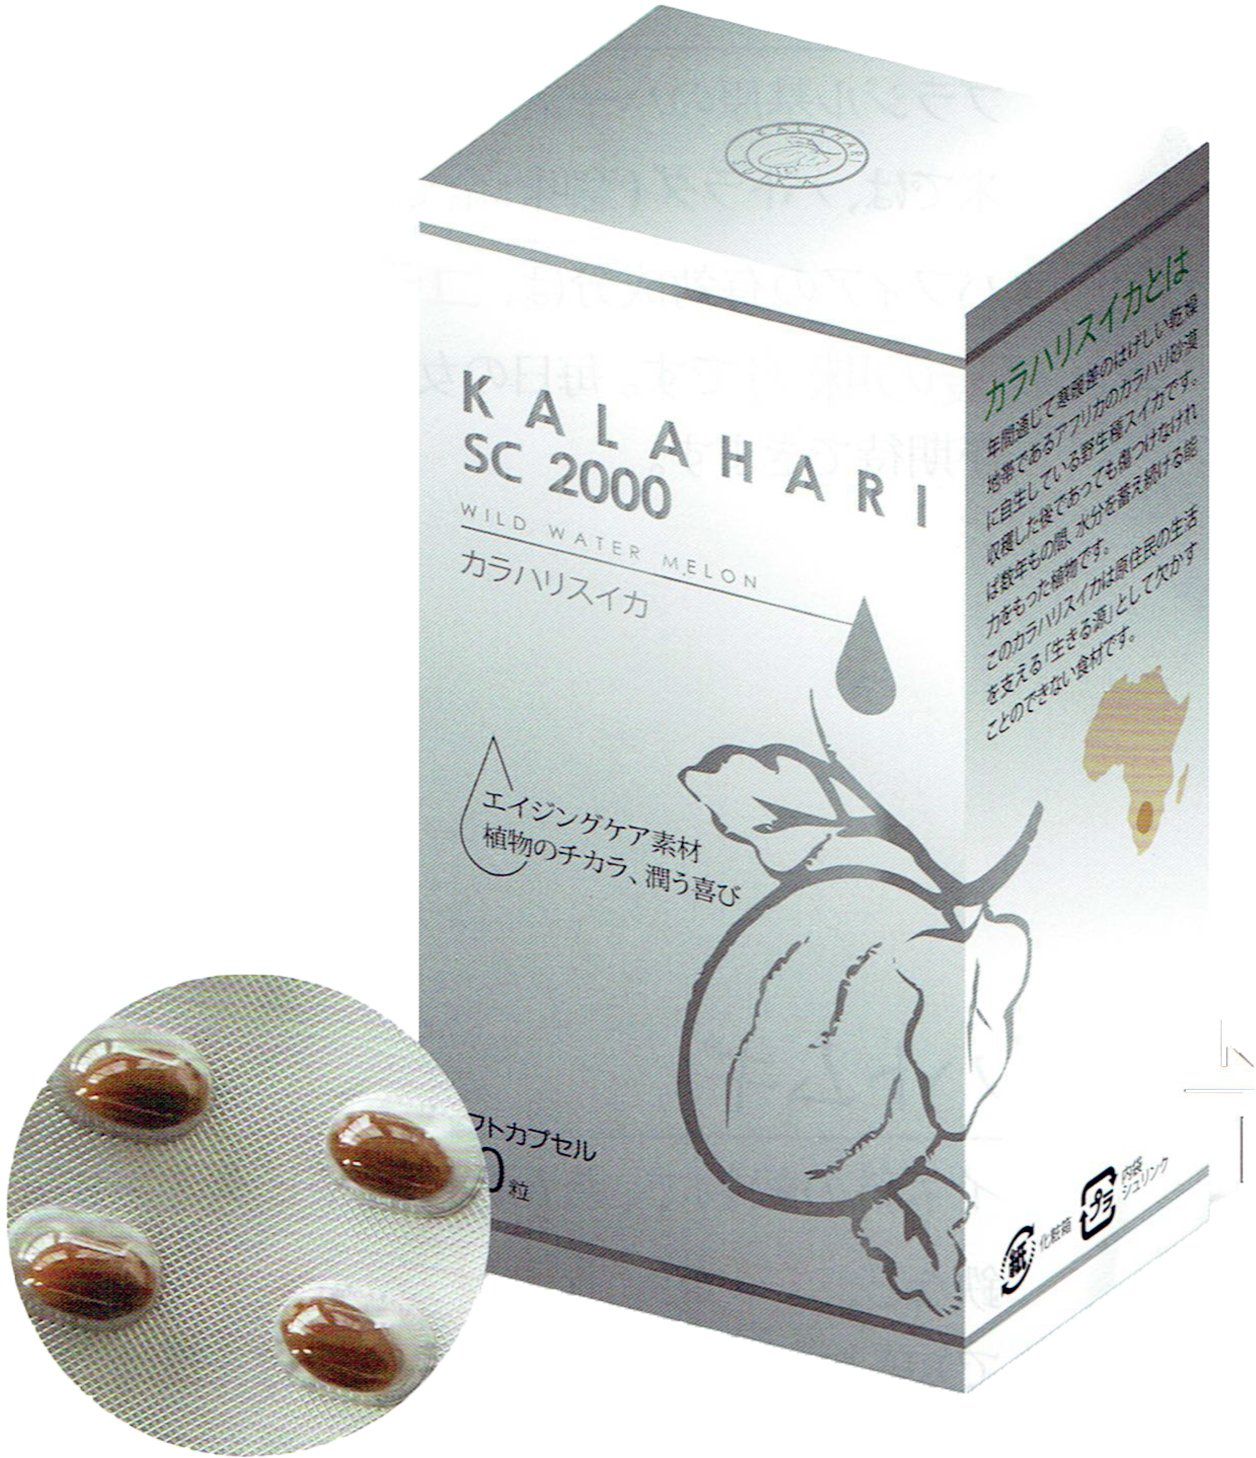 KALAHARI (カラハリ)SC 2000 60粒 B01M7QPAZF